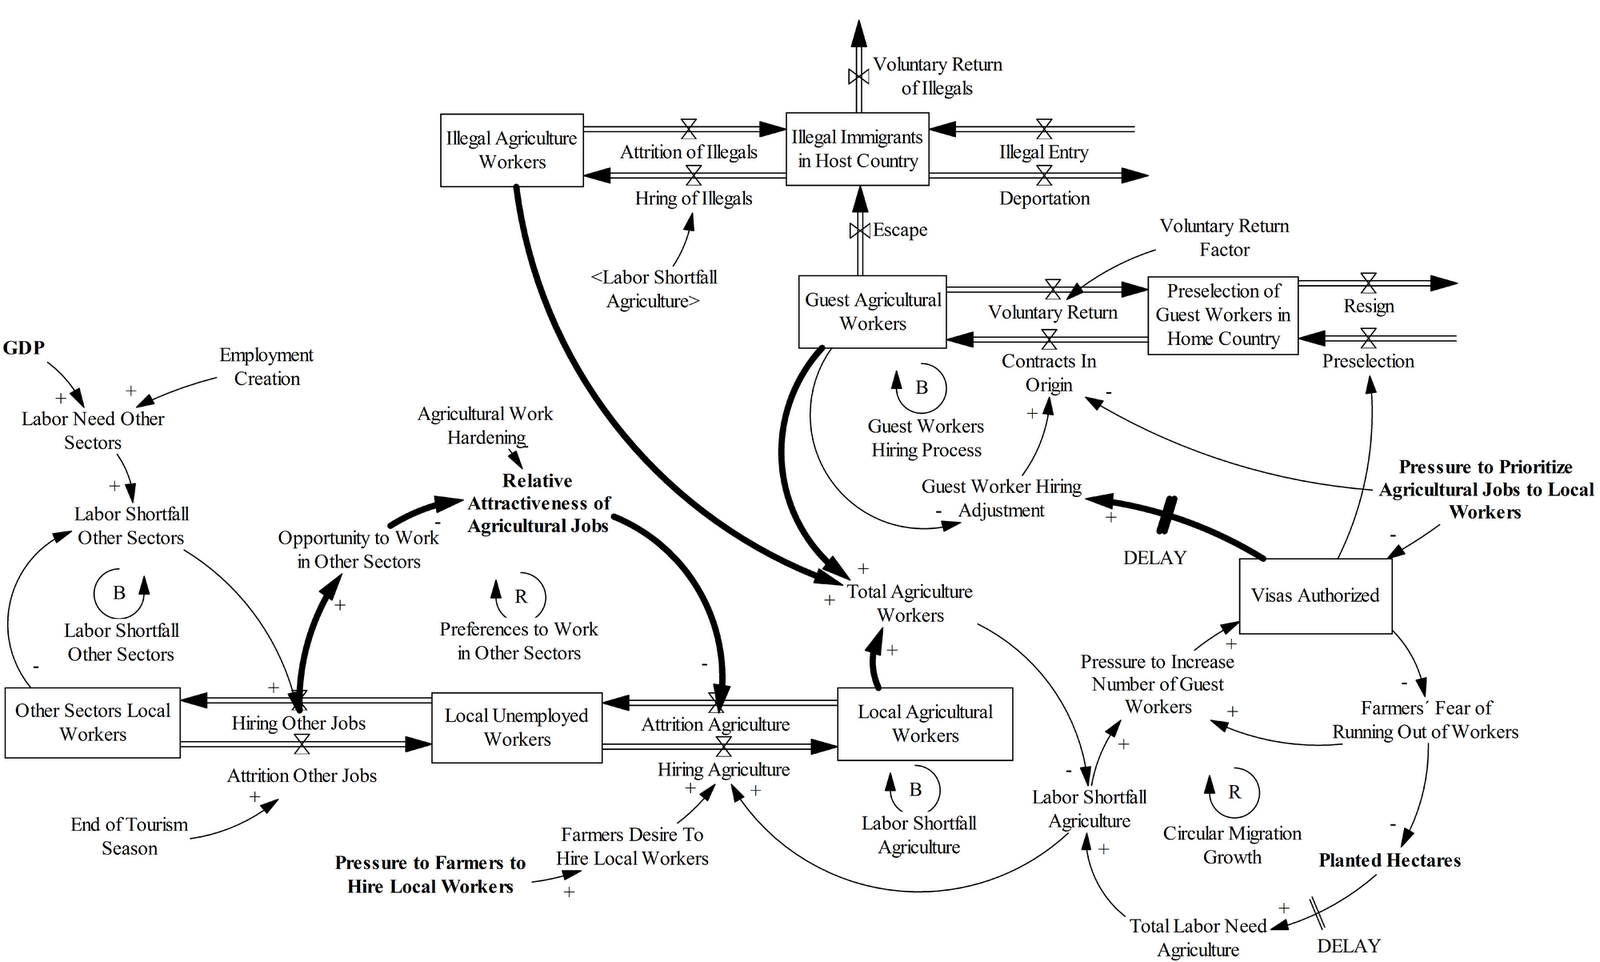 Simulation Modeling Technics